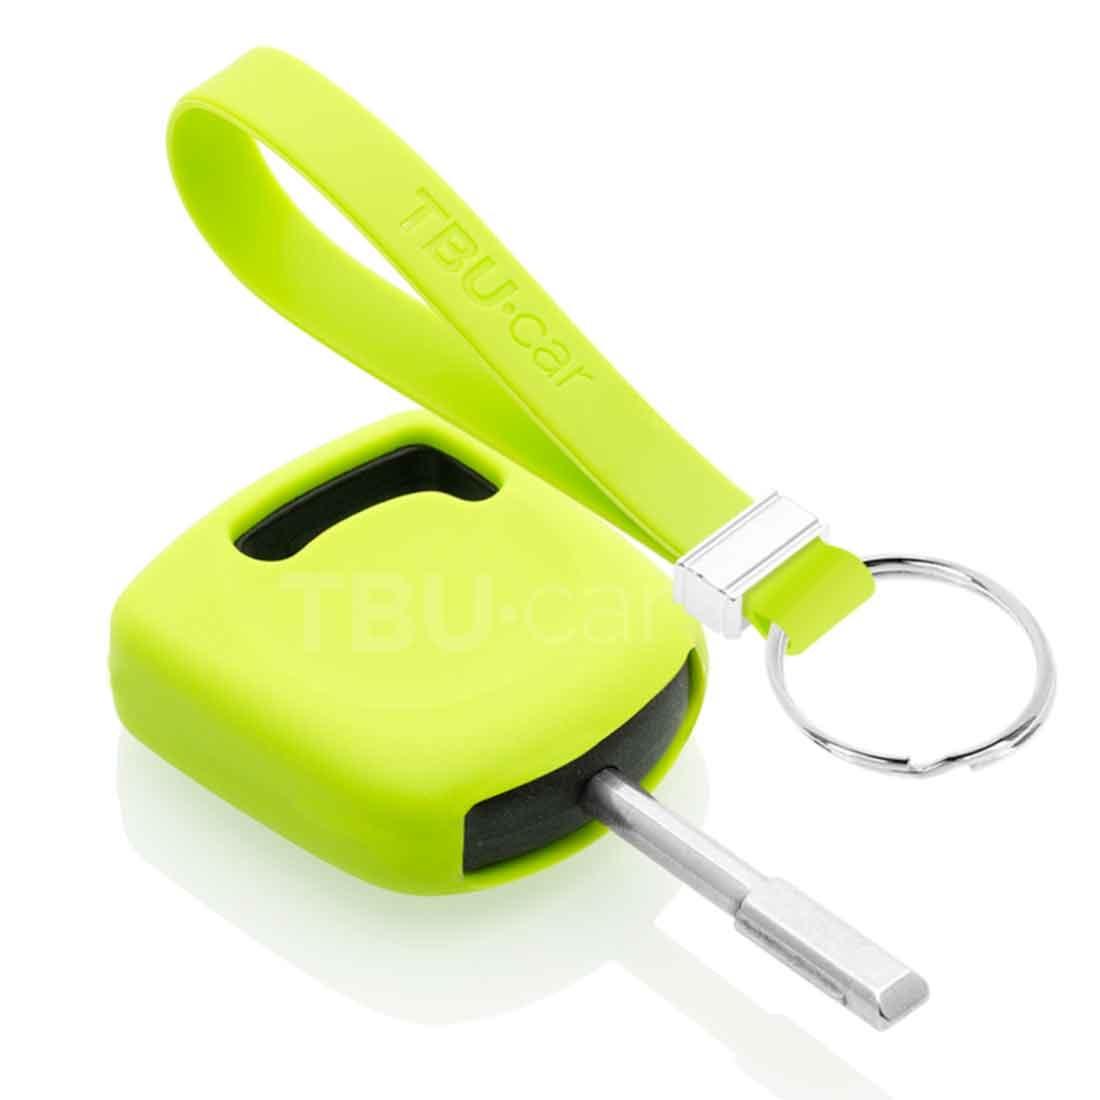 TBU car TBU car Autoschlüssel Hülle kompatibel mit Ford Standardschlüssel - Schutzhülle aus Silikon - Auto Schlüsselhülle Cover in Lindgrün